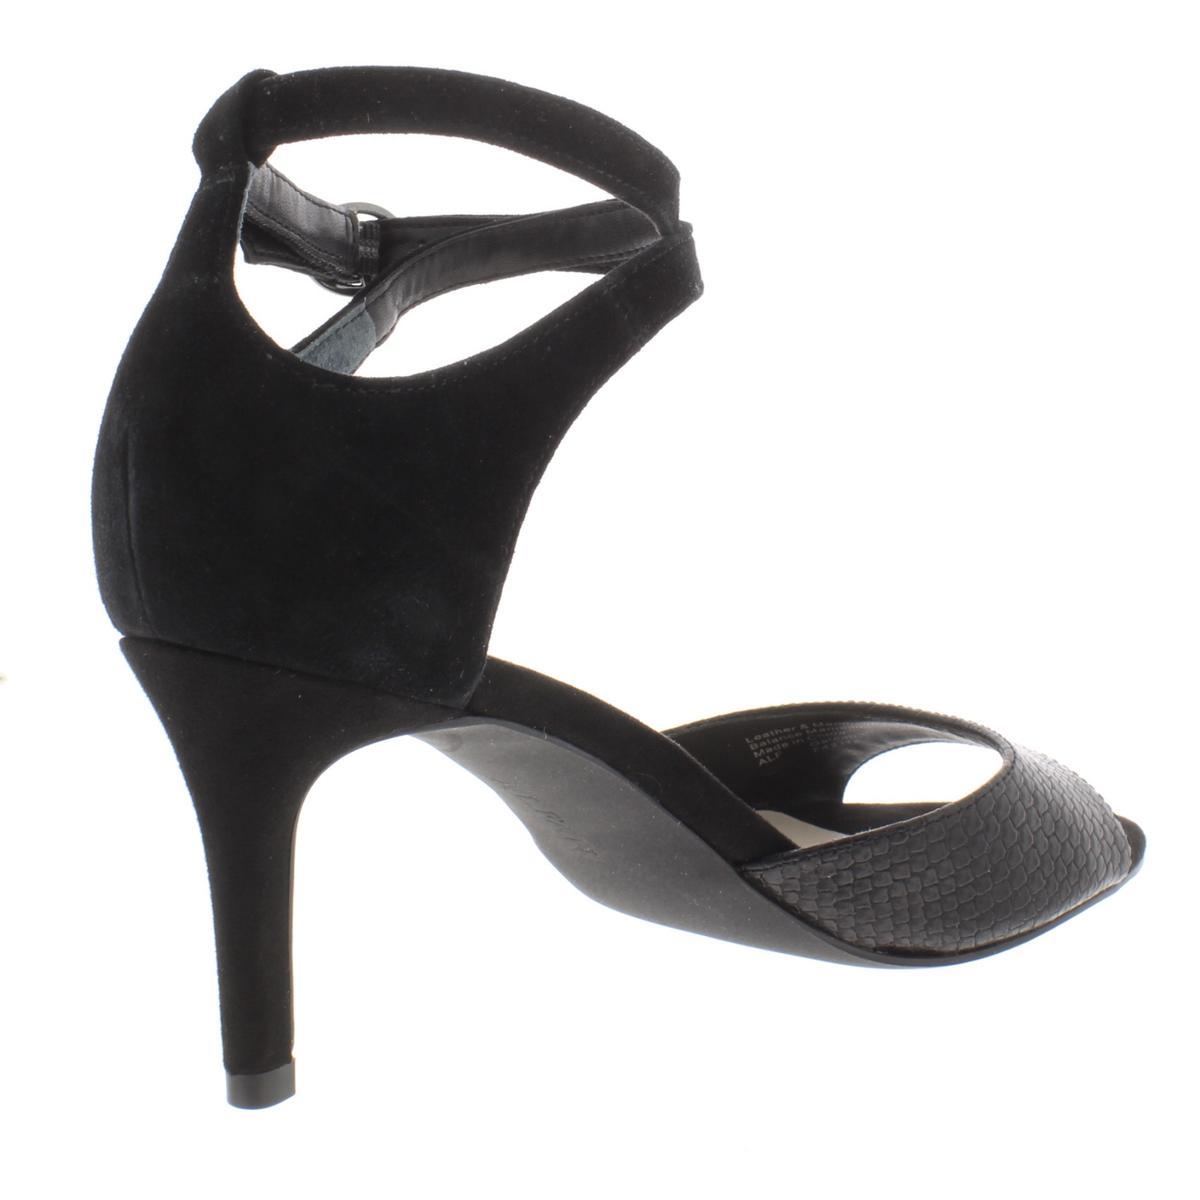 Alfani Womens Galeah Embossed Ankle Strap Heels Dress Sandals Shoes BHFO 7878